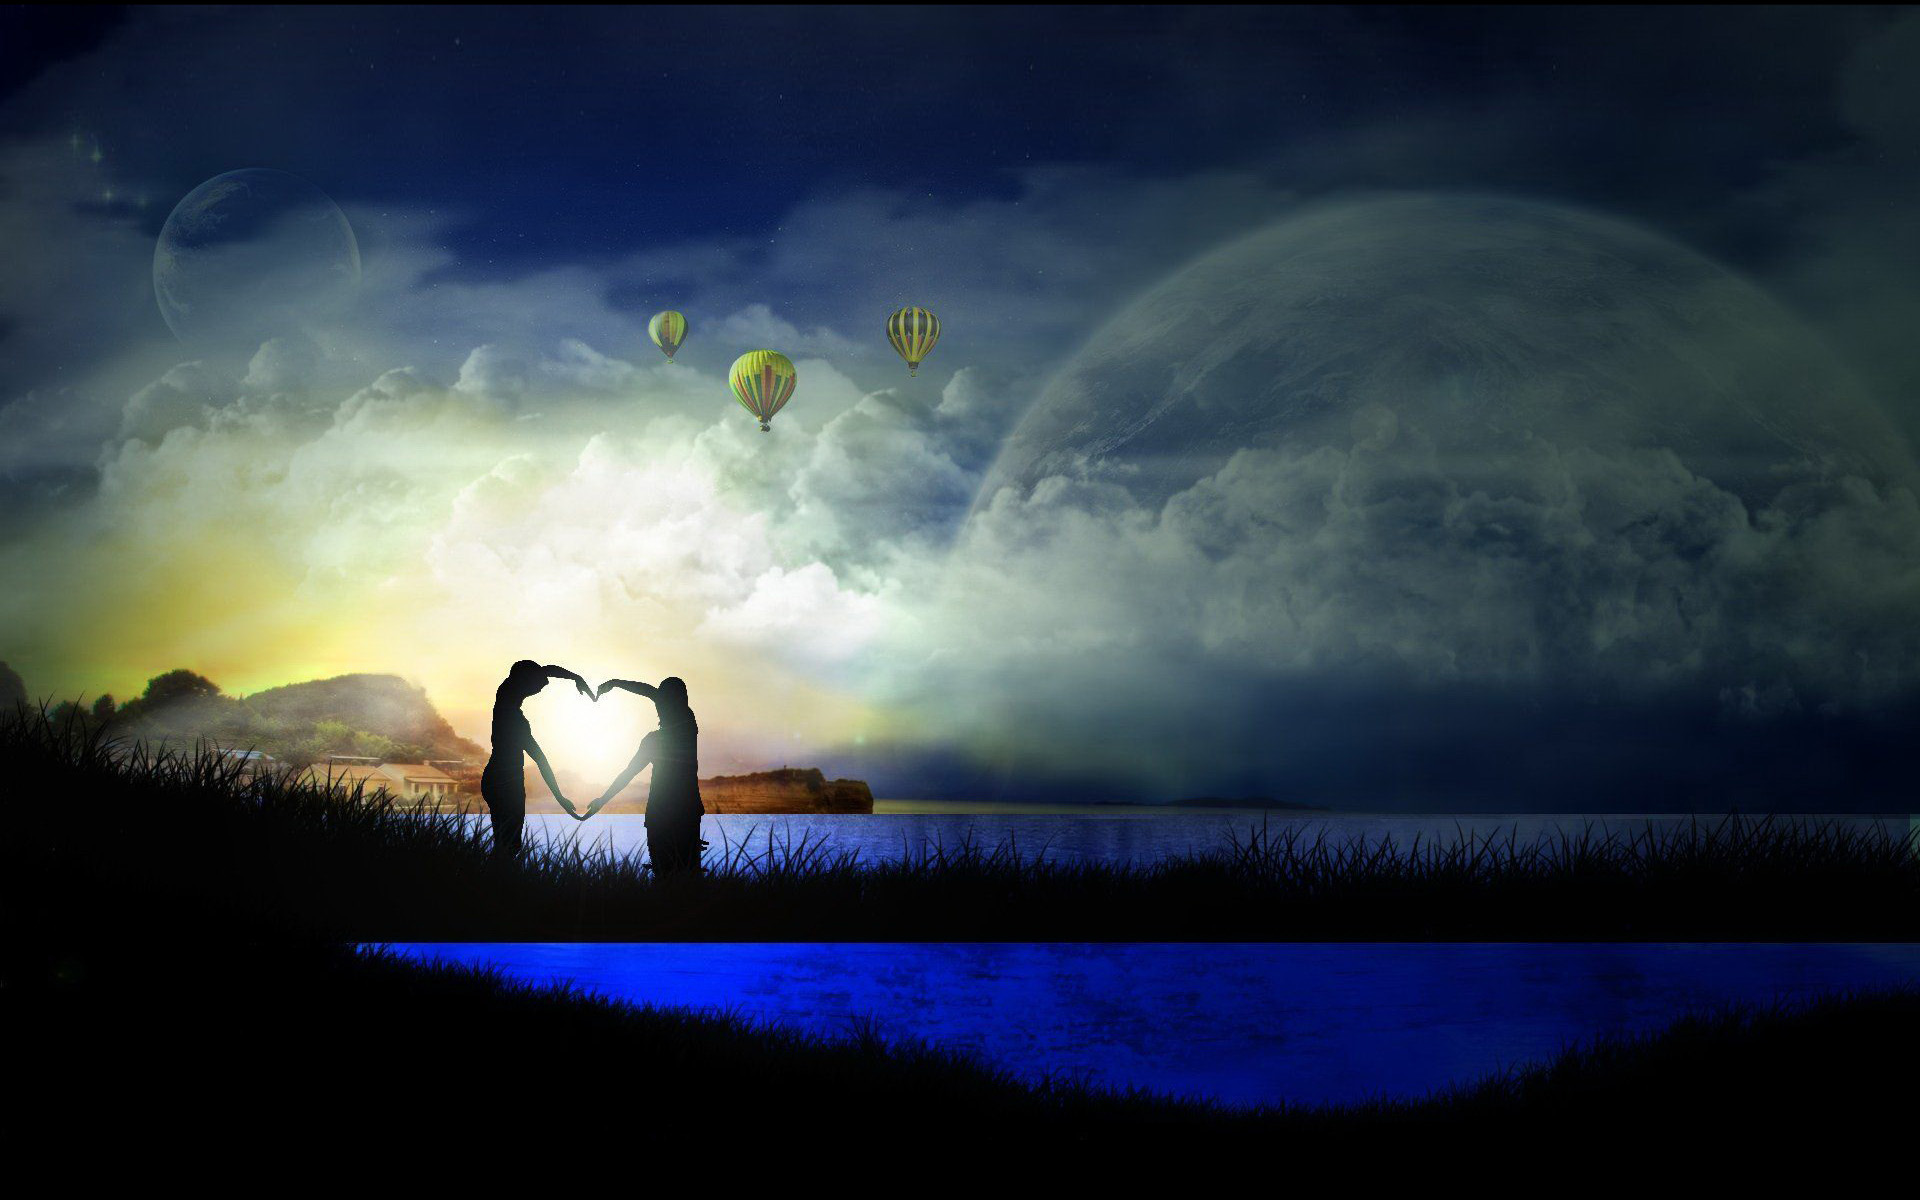 Best love wallpapers hd wallpapersafari - Love wallpapers hd ...